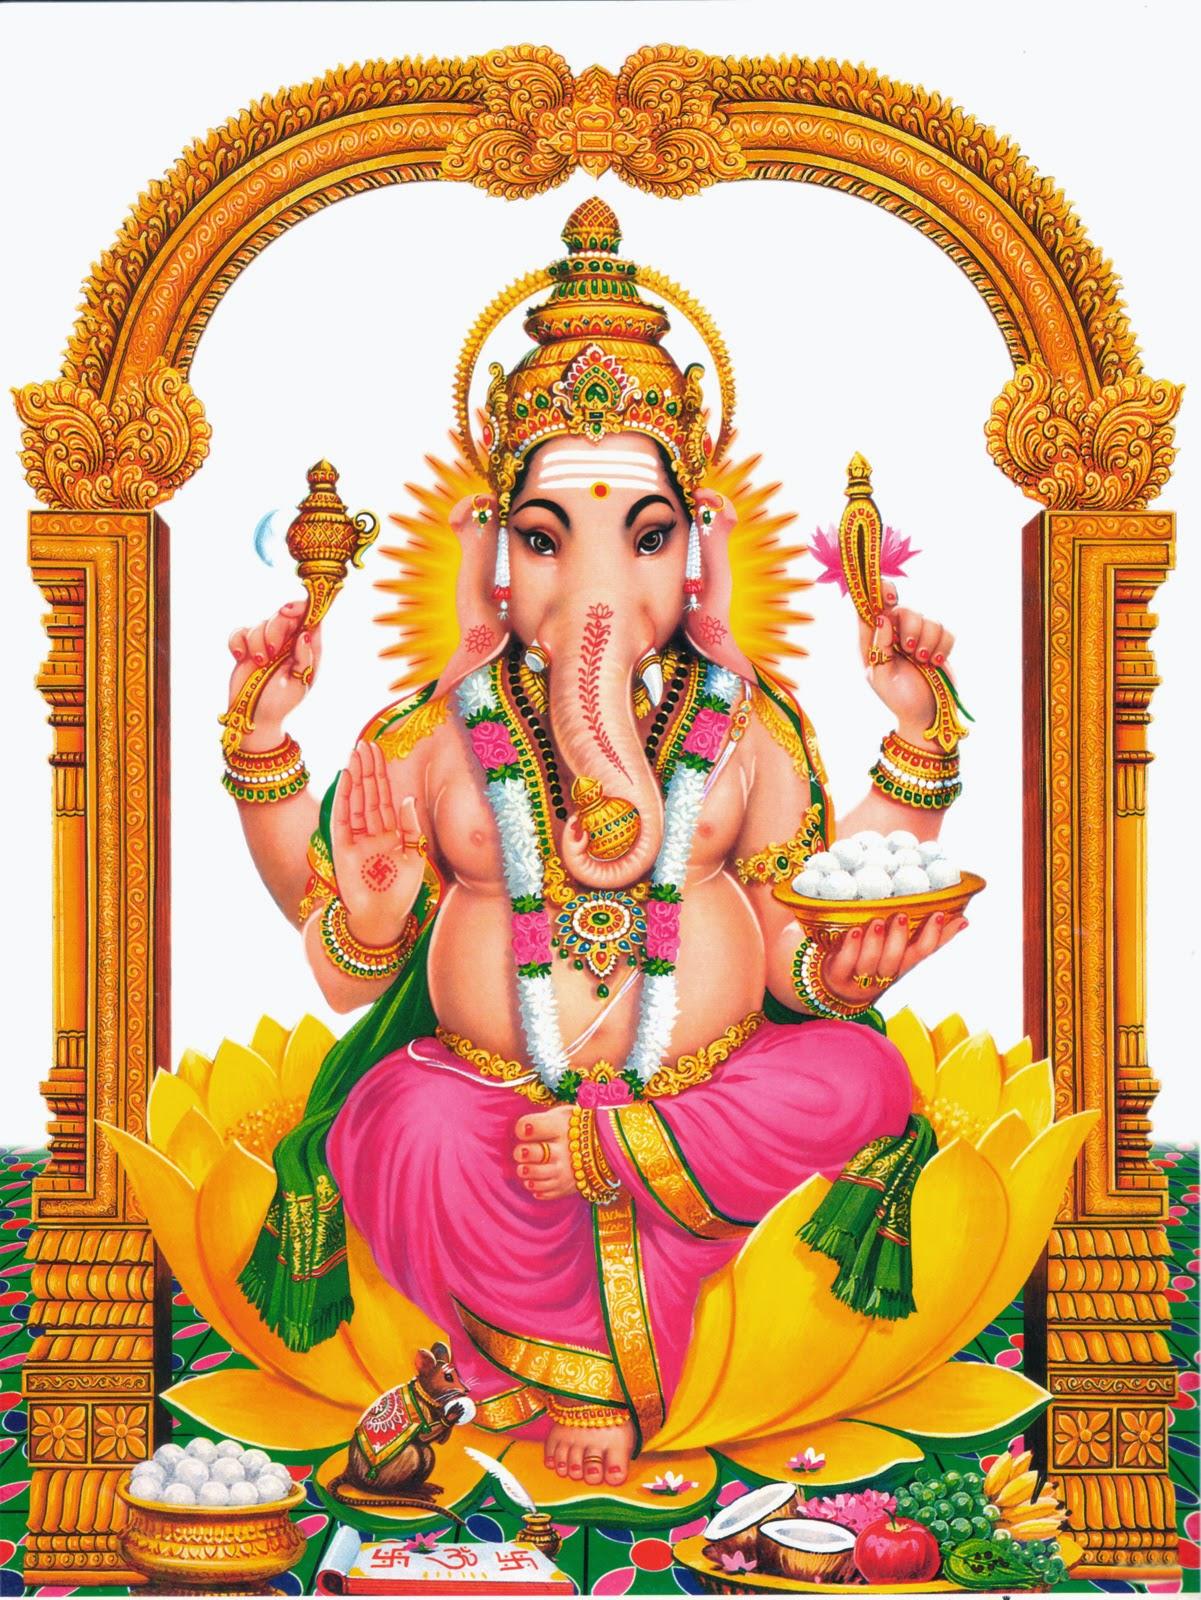 Hd wallpaper vinayagar - Lord Vinyagar Pictures